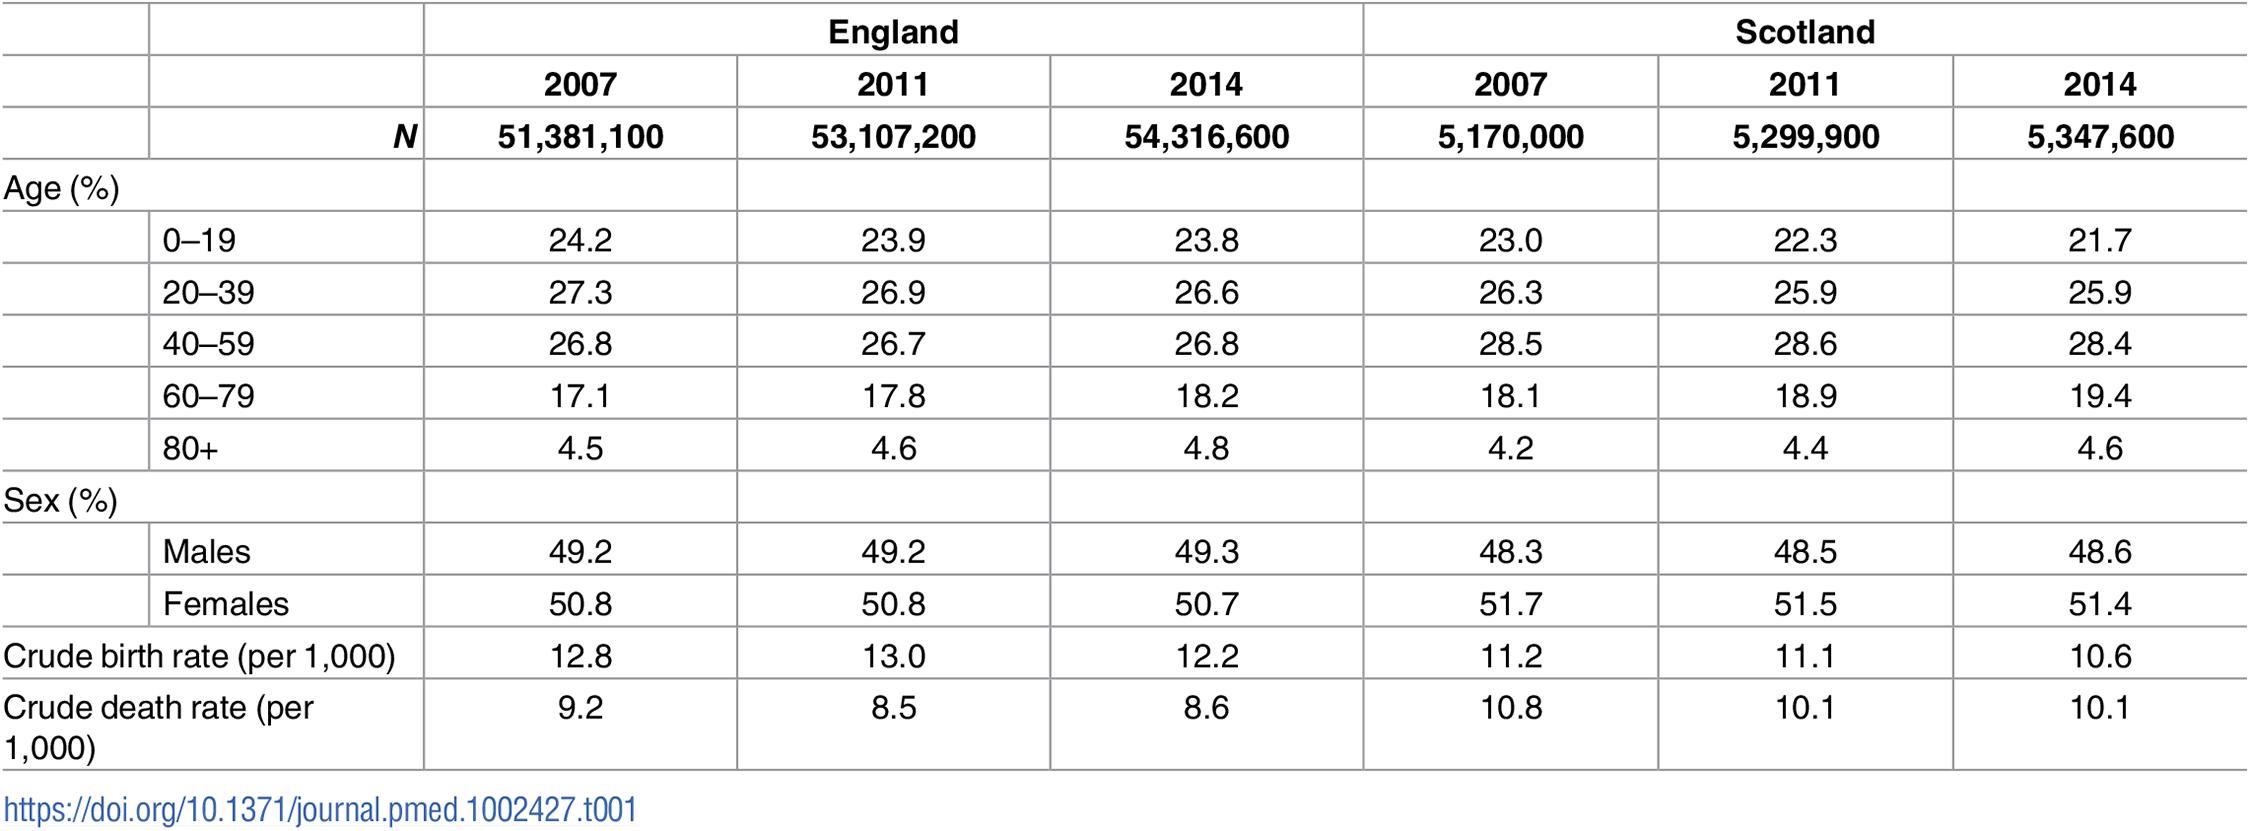 Population characteristics of England and Scotland, 2007–2014.